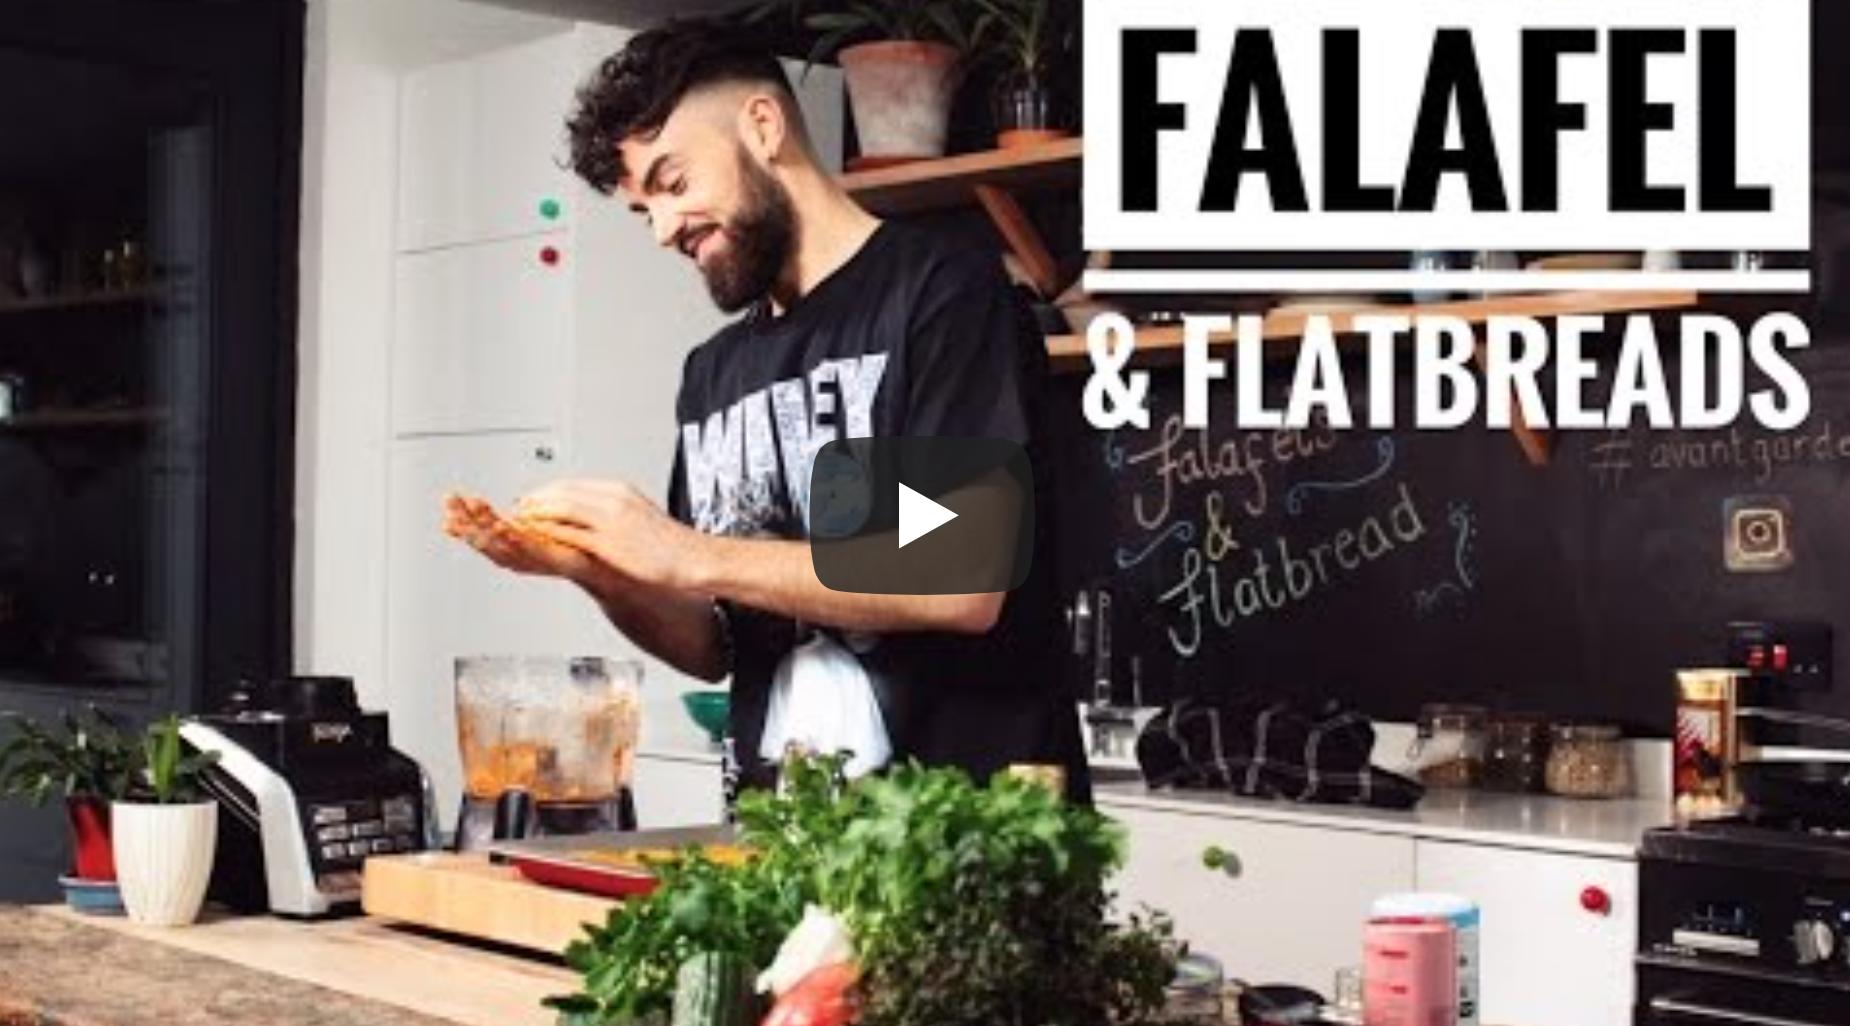 FALAFEL & FLATBREADS | Avant-Garde Vegan | VeganFlix